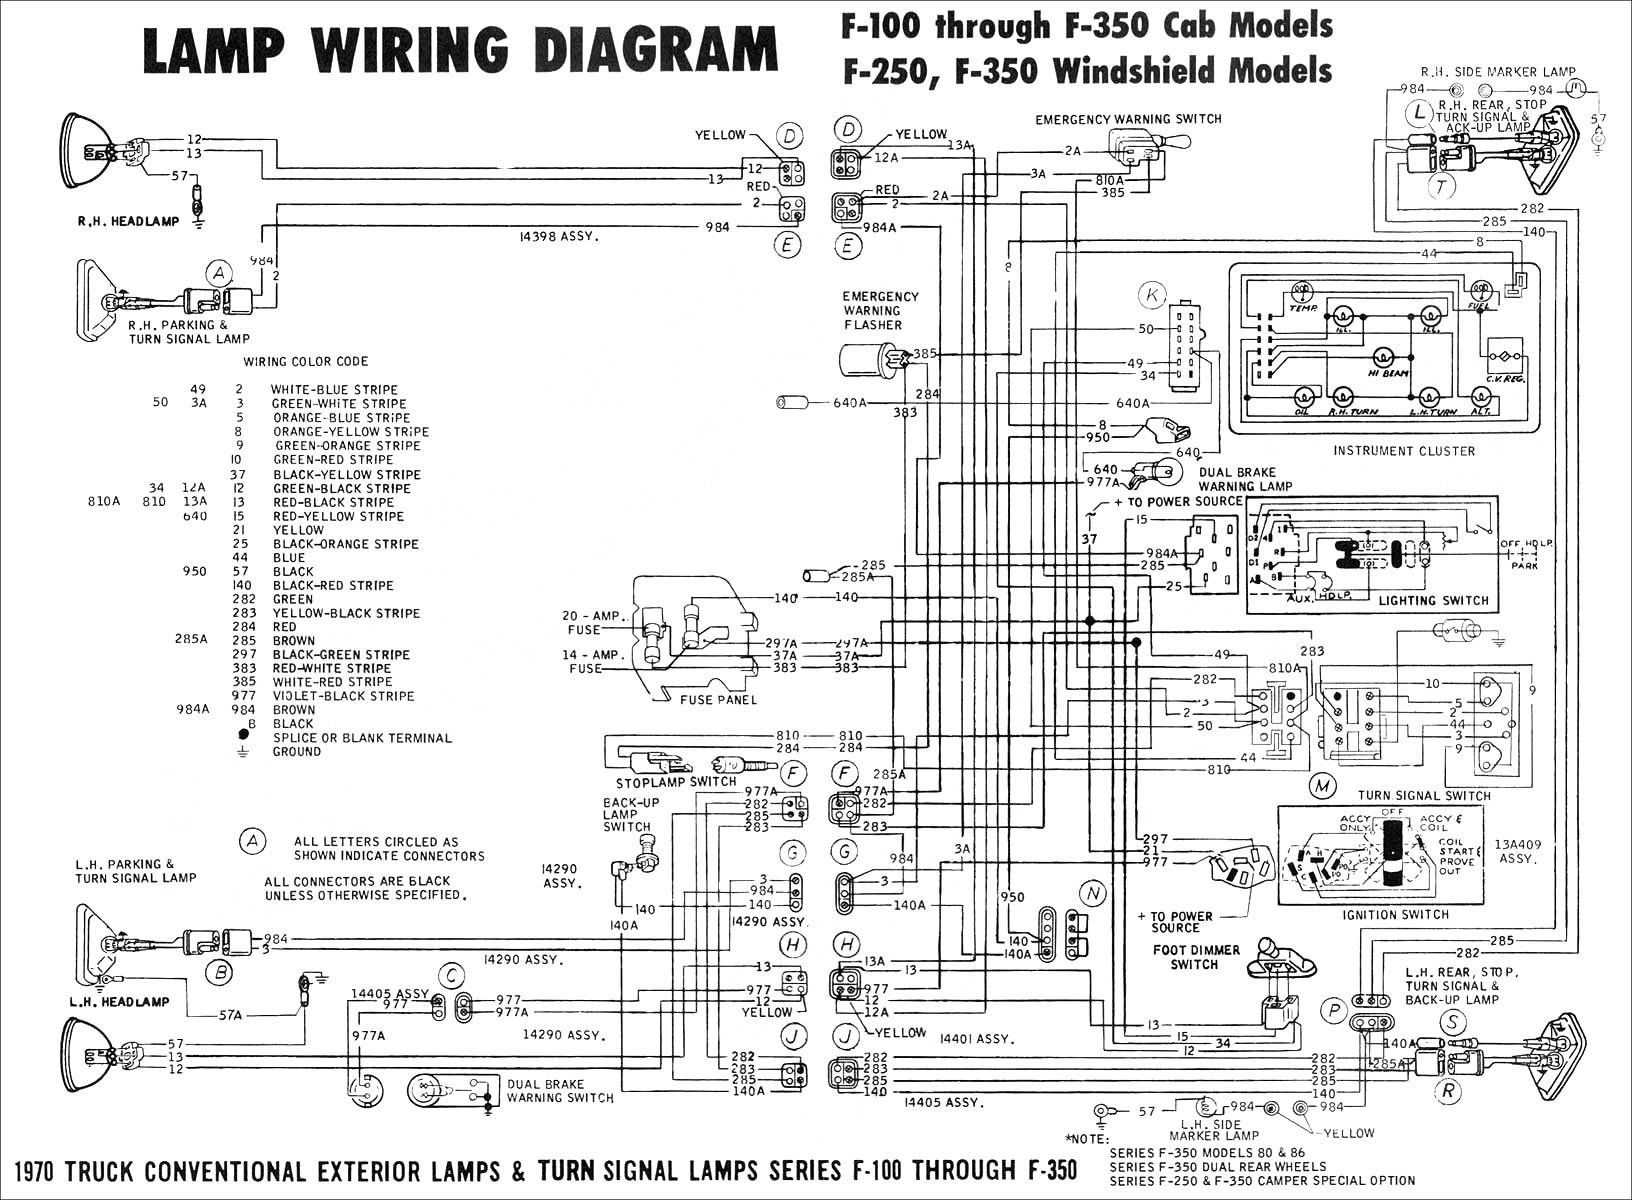 Toyota Rav4 Under Hood Wiring Diagrams Wiring Diagram Miss Management Miss Management Riply It